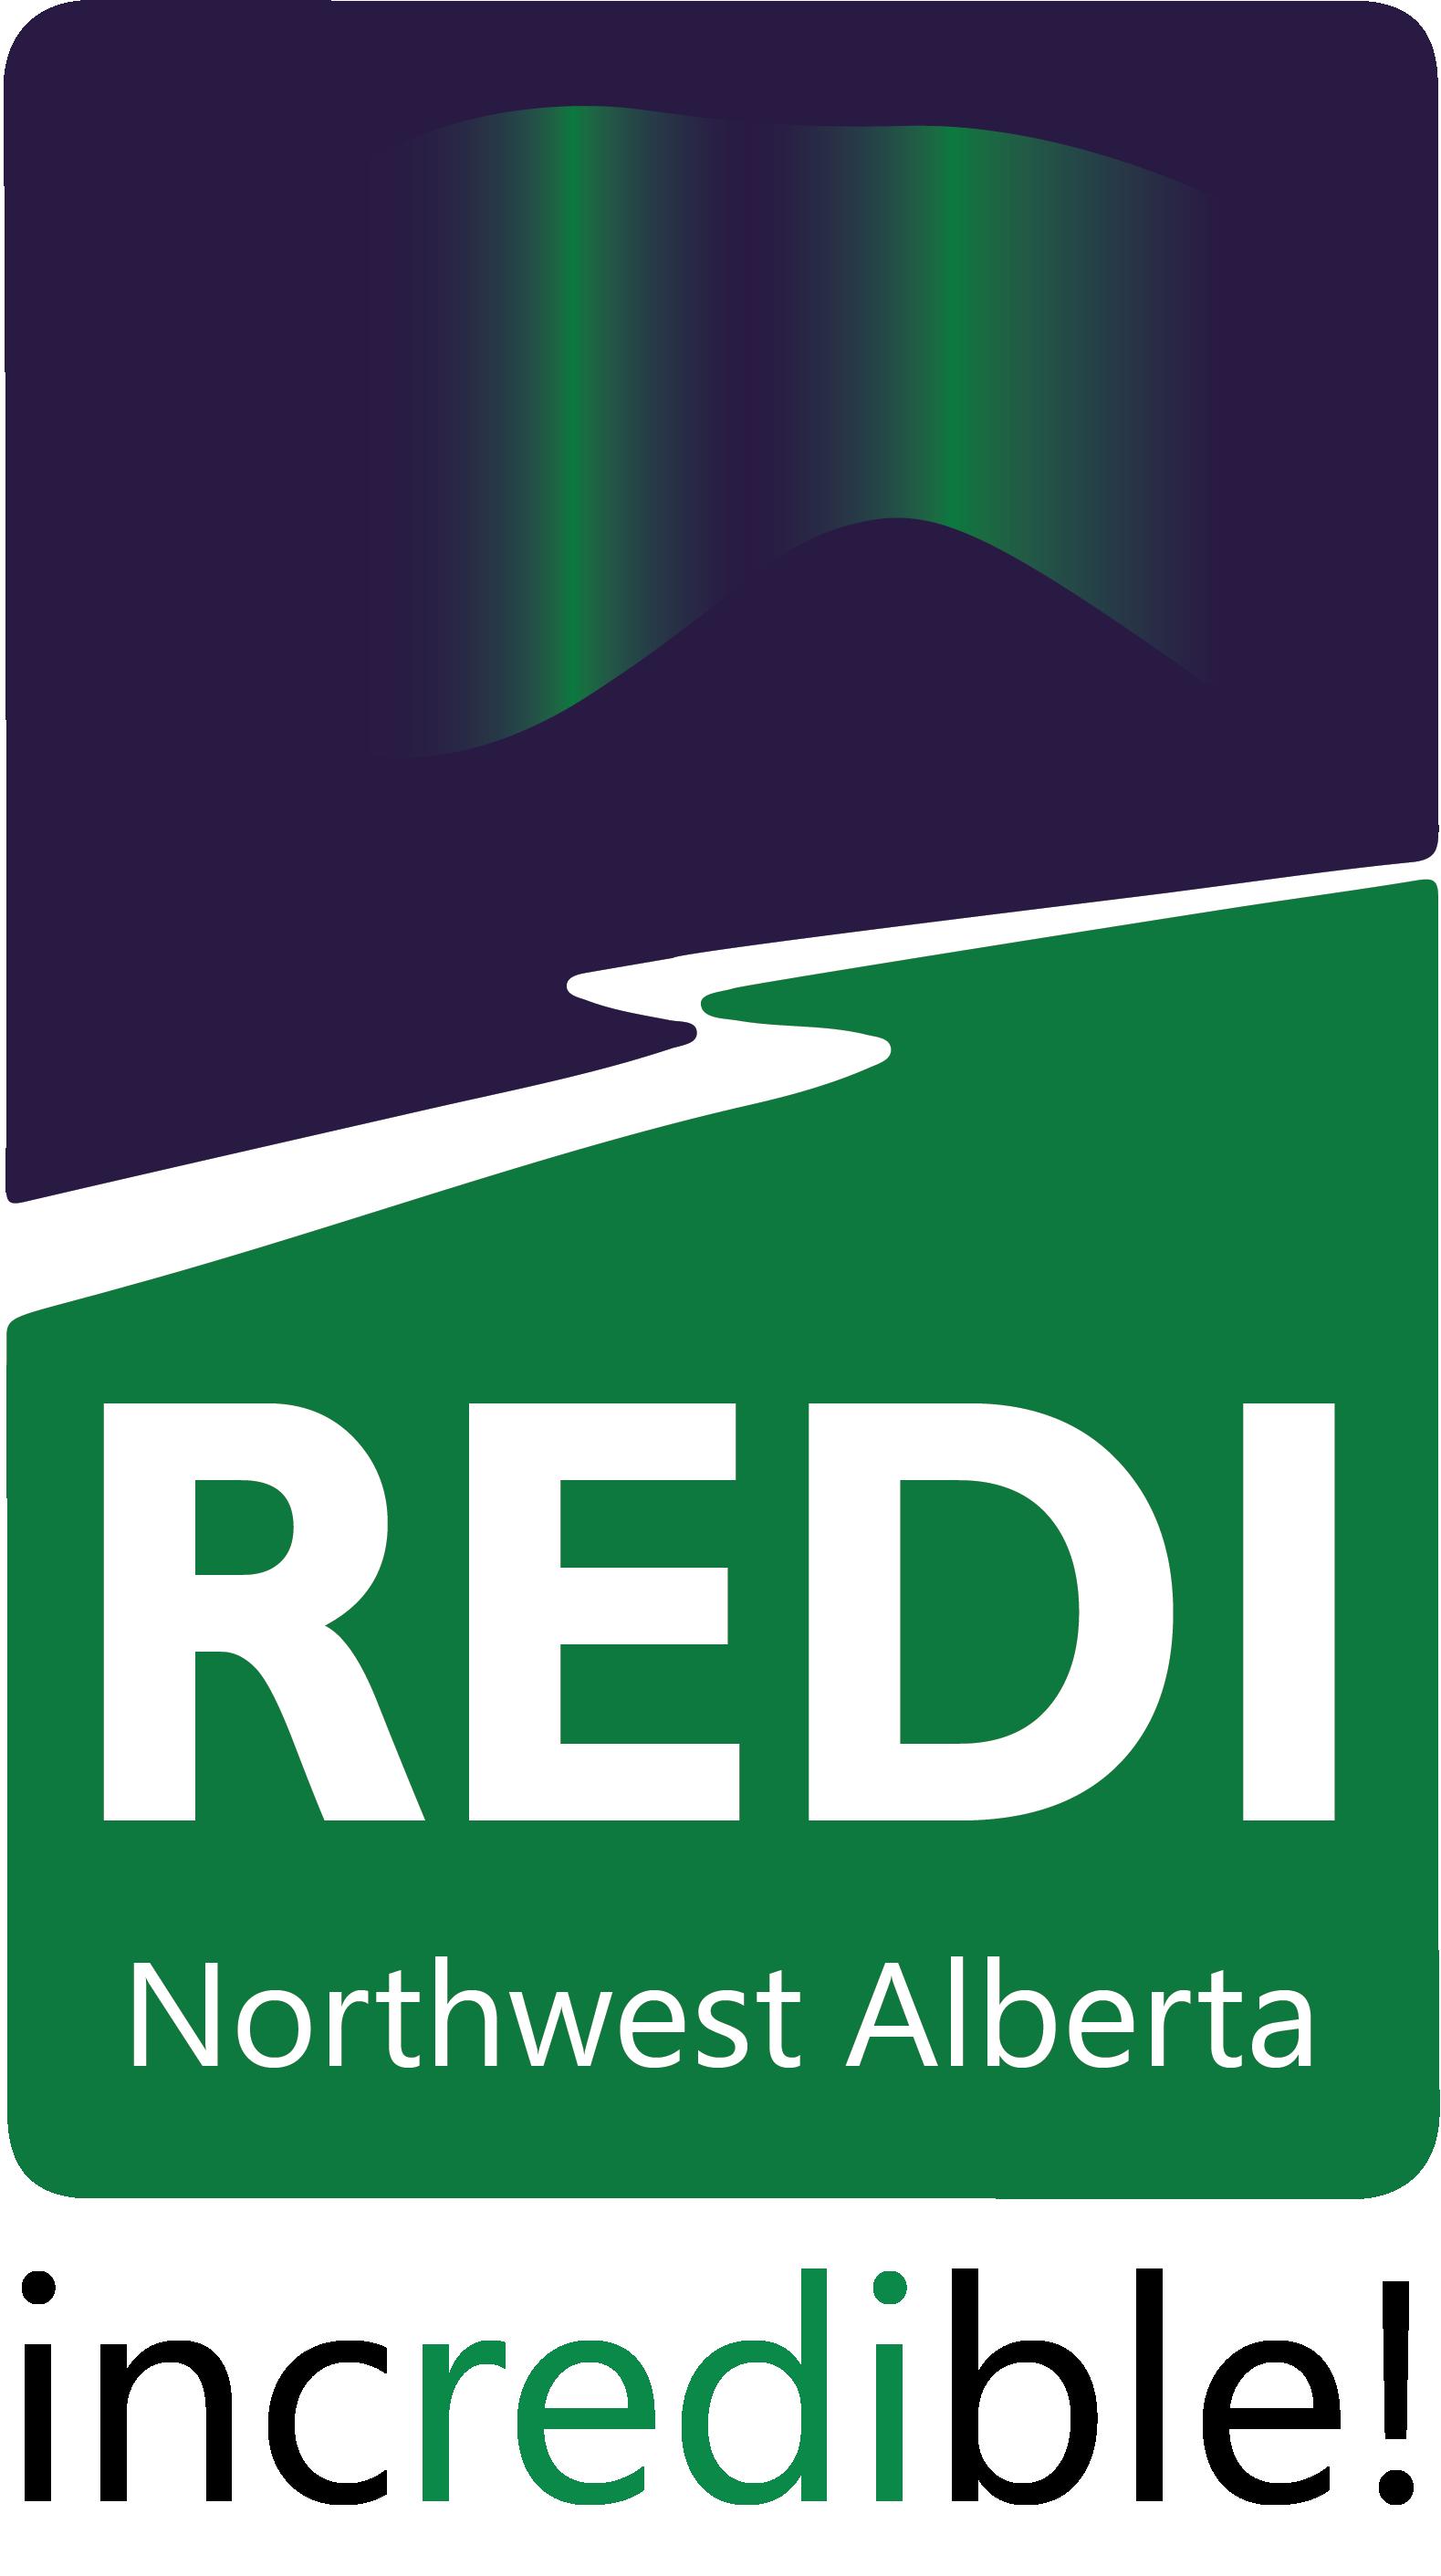 REDI Region - Regional Economic Development Initiative - Northwest Alberta